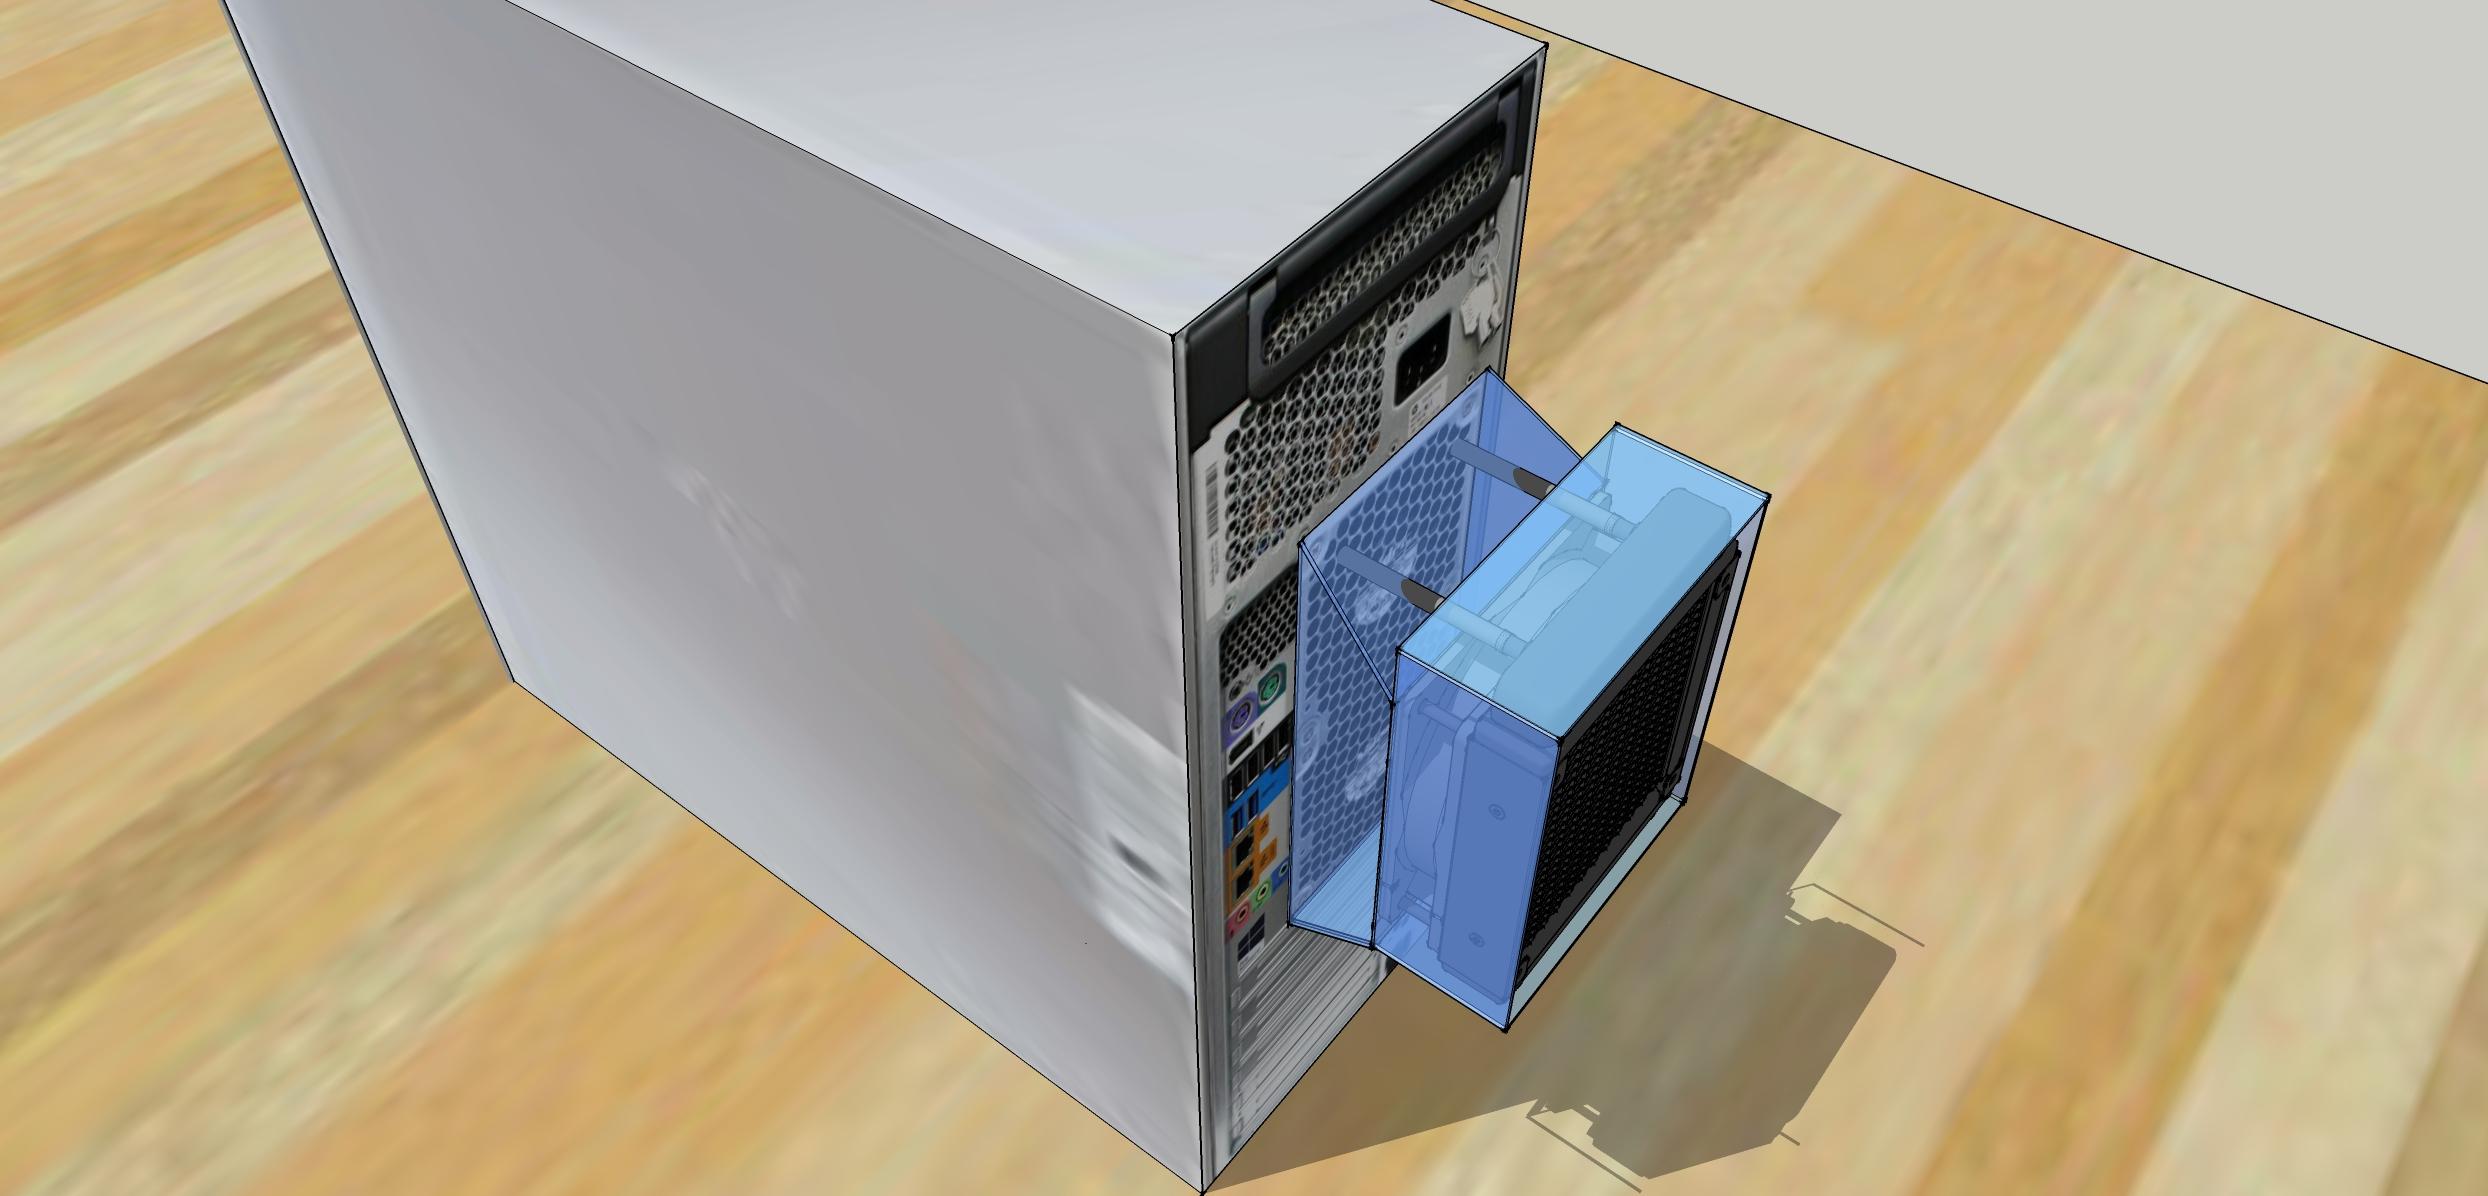 z620 Liquid Cooling_RR_6.25.17.jpg